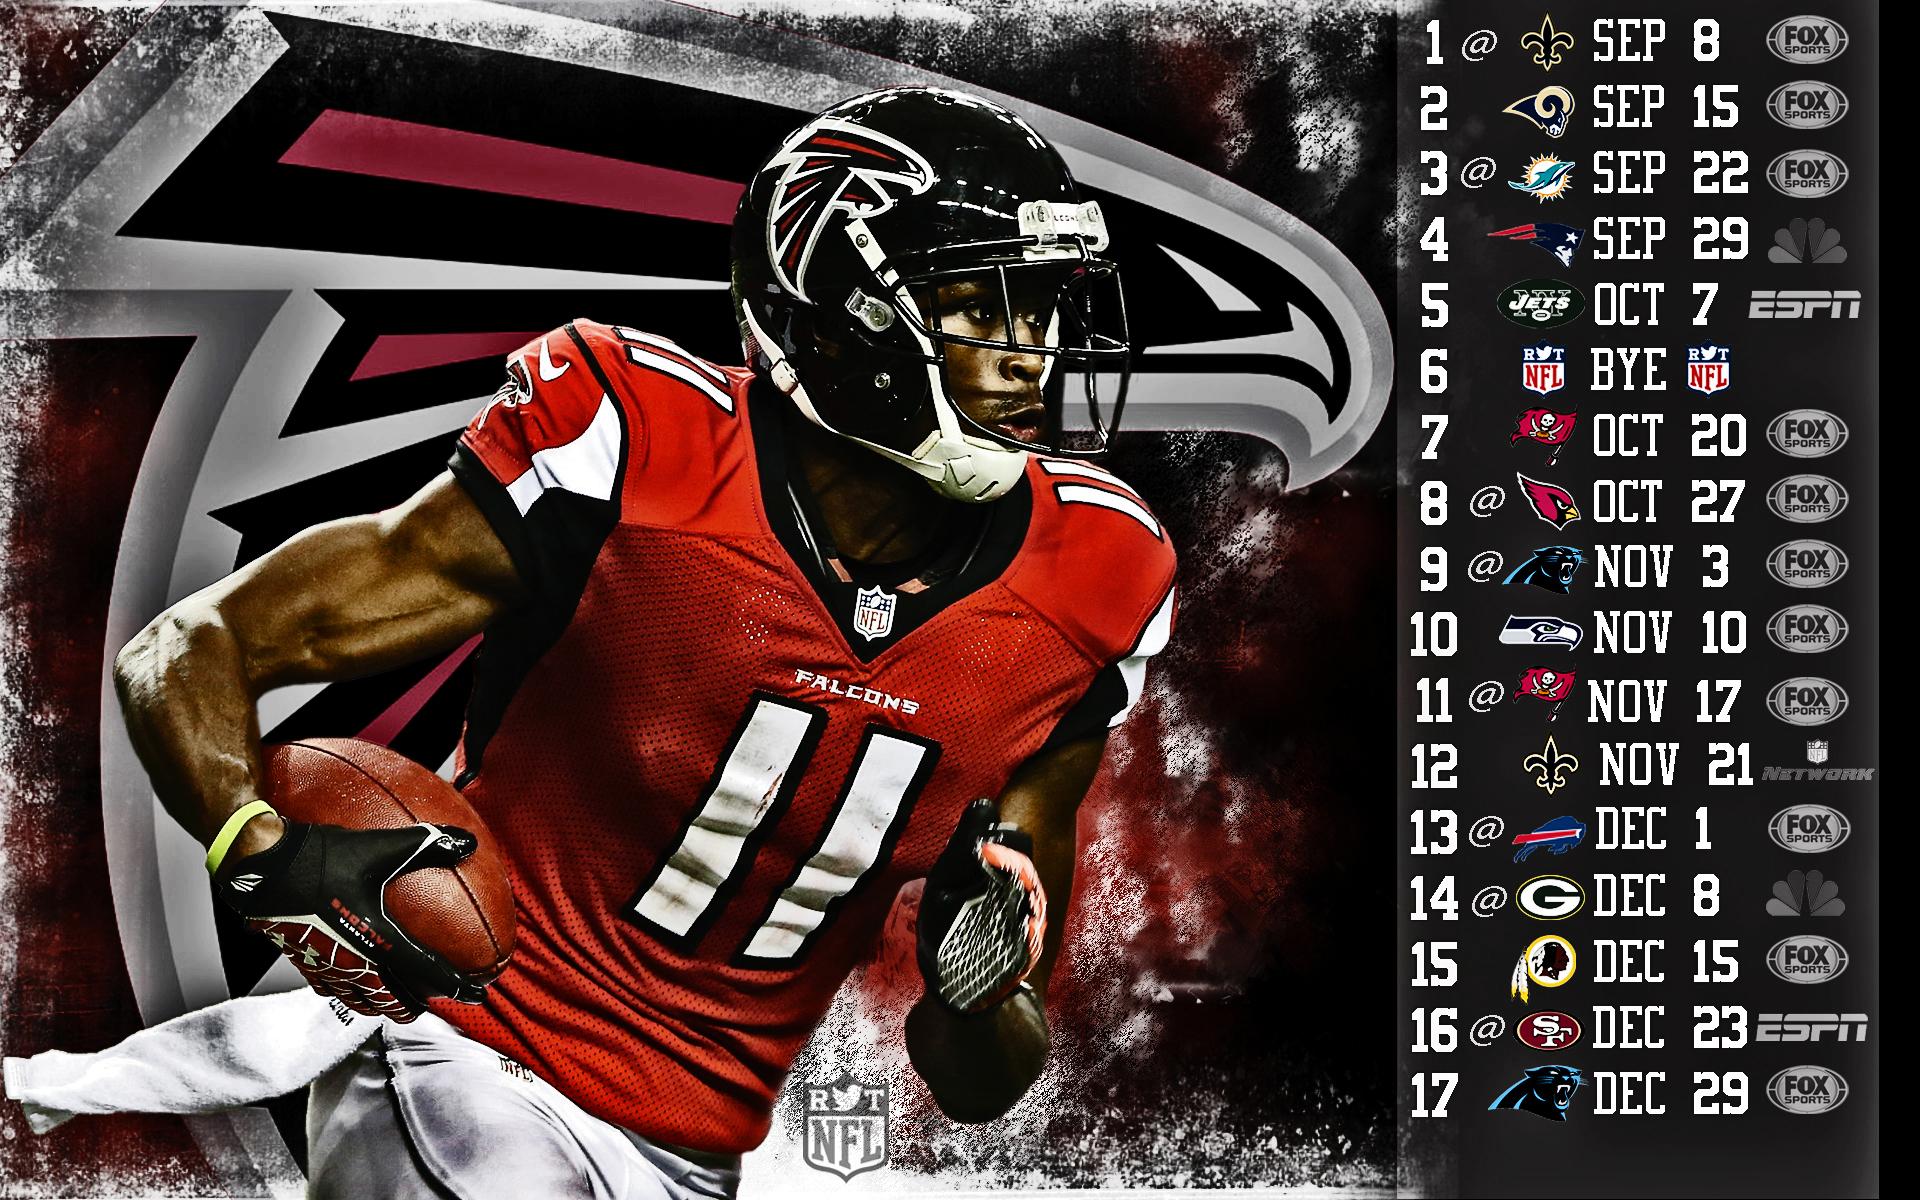 Atlanta Falcons Logo Photos Nfl Iphone Wallpapers: 2013 Atlanta Falcons Football Nfl Wallpaper